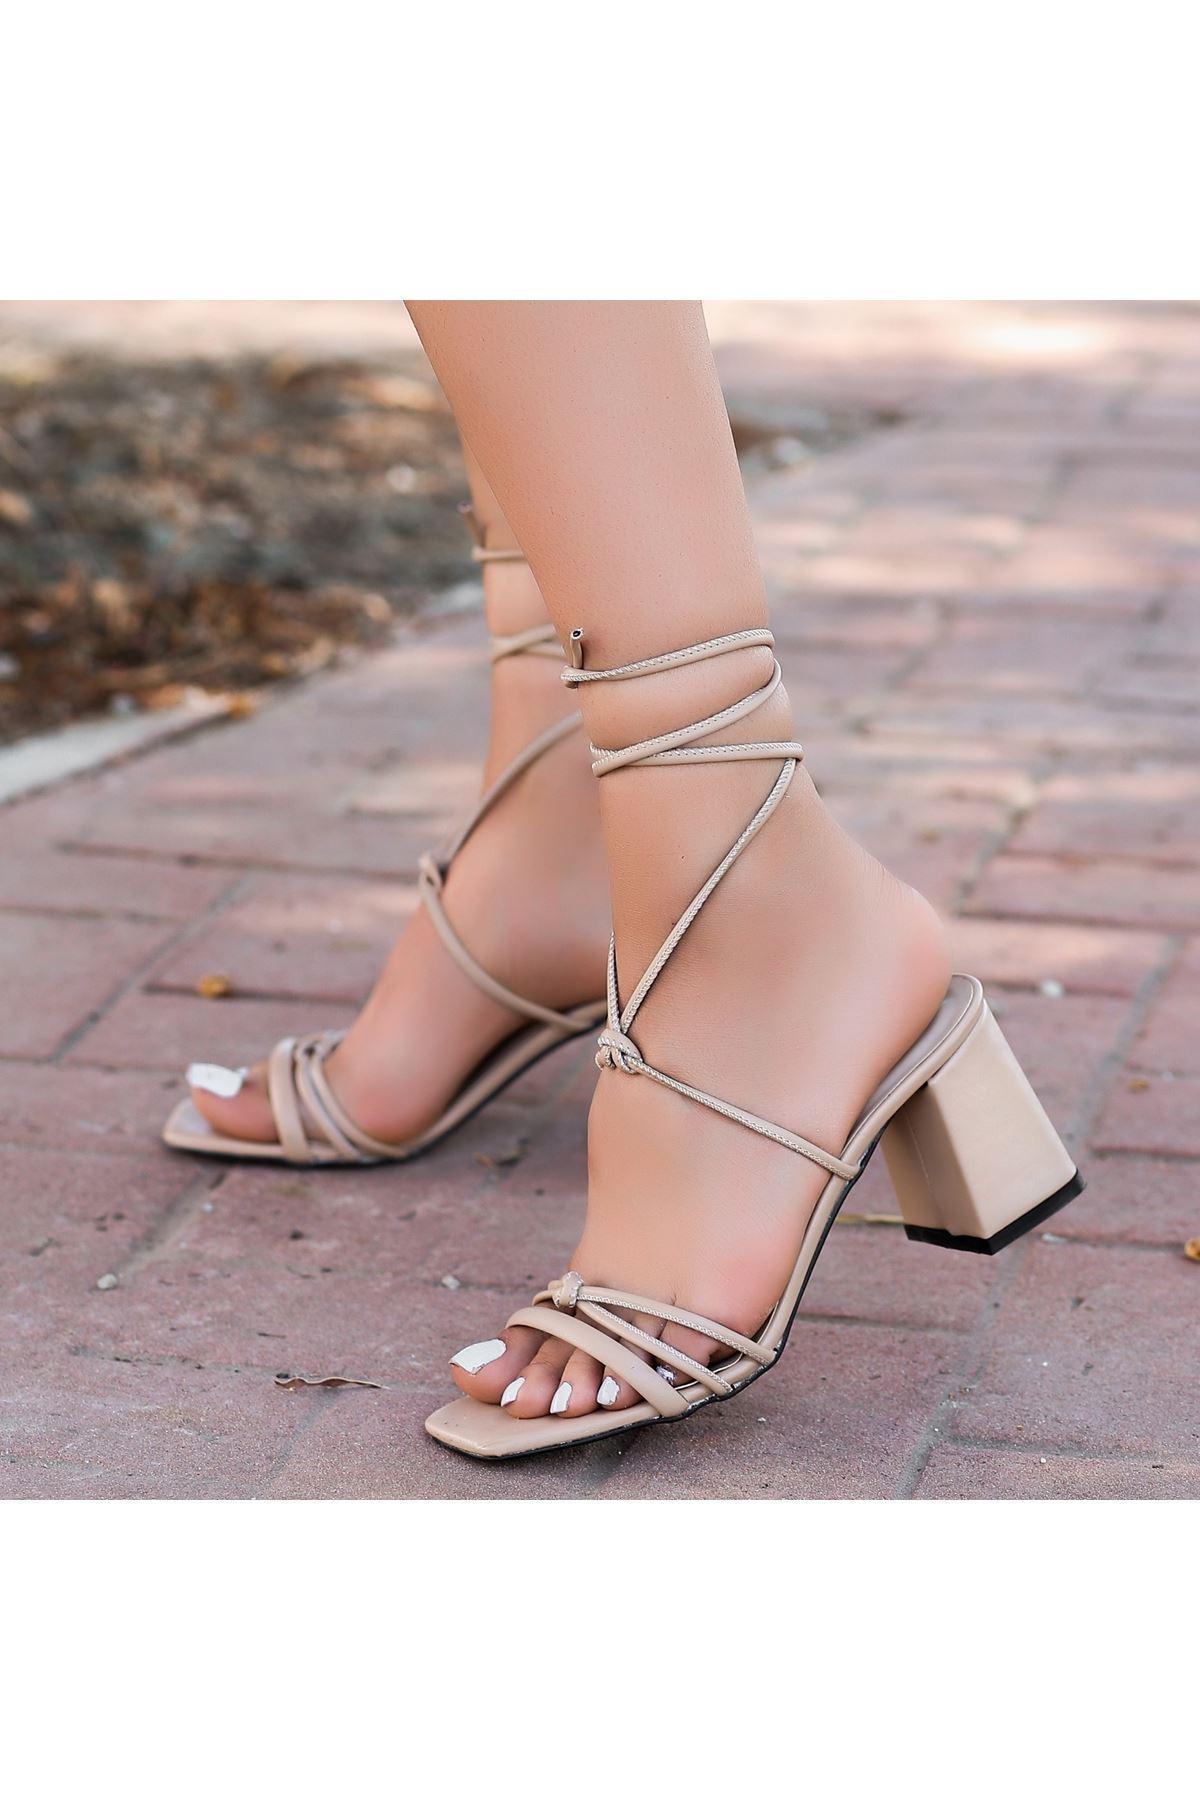 Jost Vizon Cilt Topuklu Ayakkabı